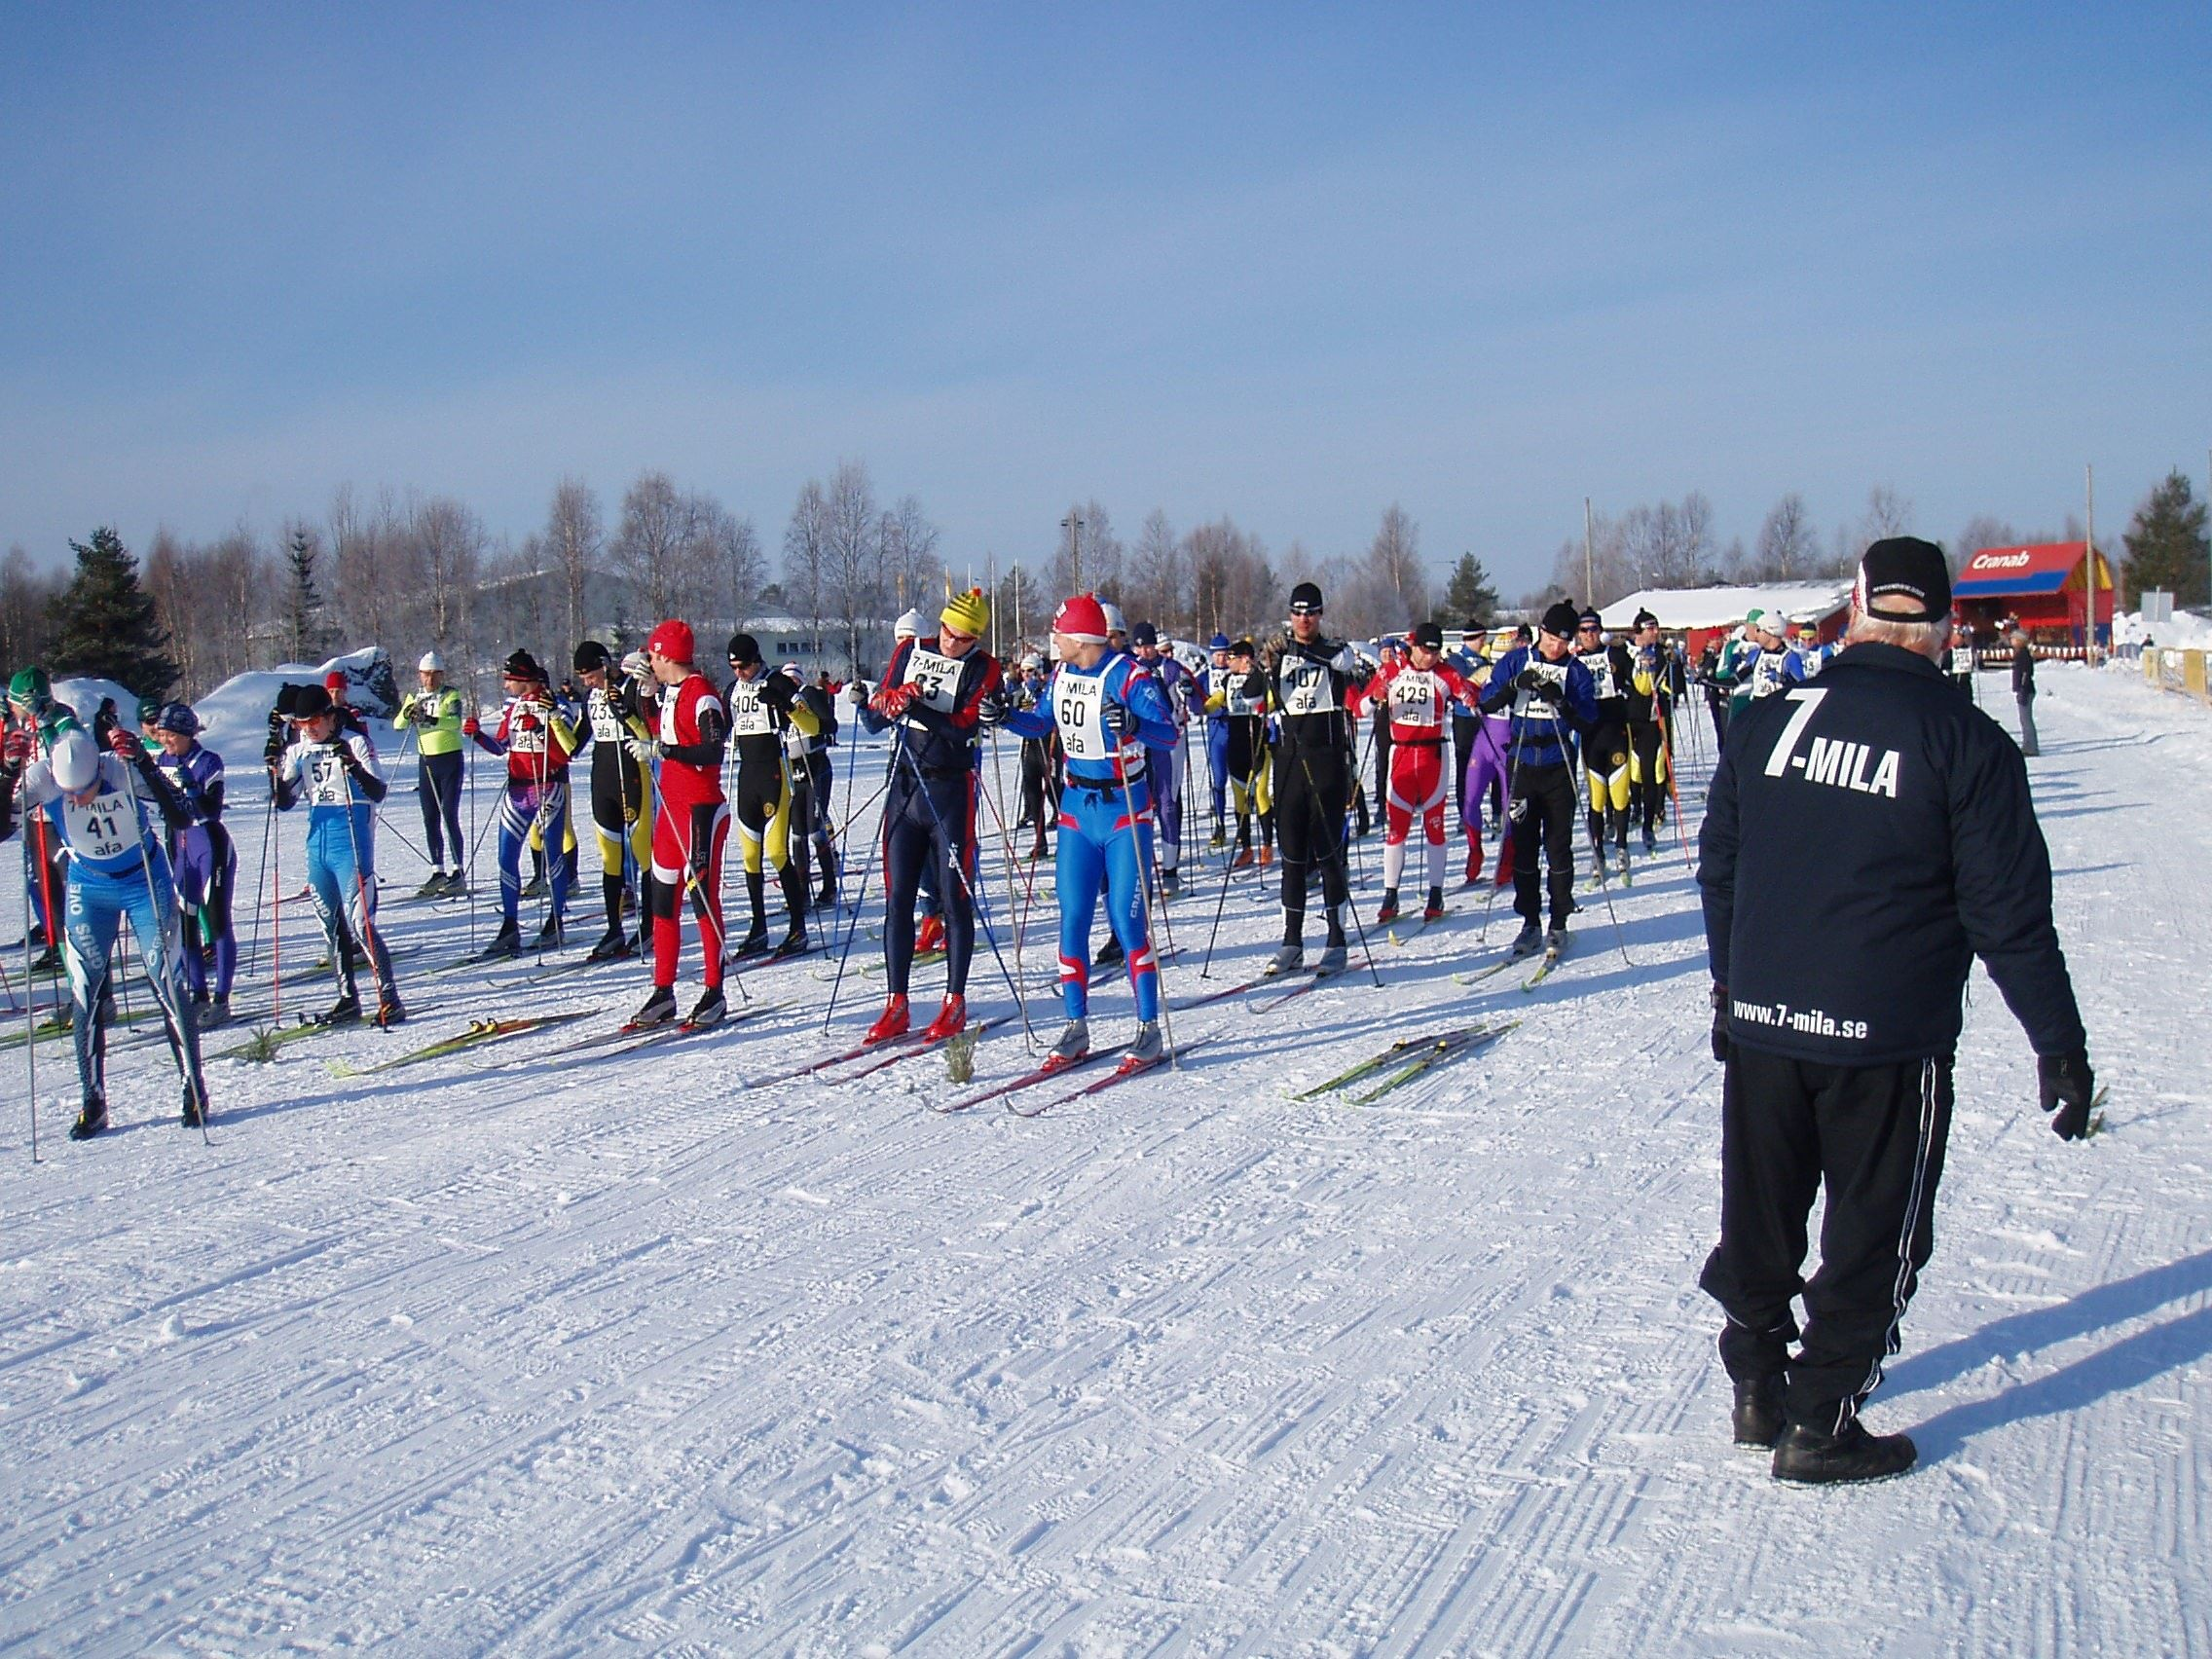 7-mila, Västerbottens skidfest